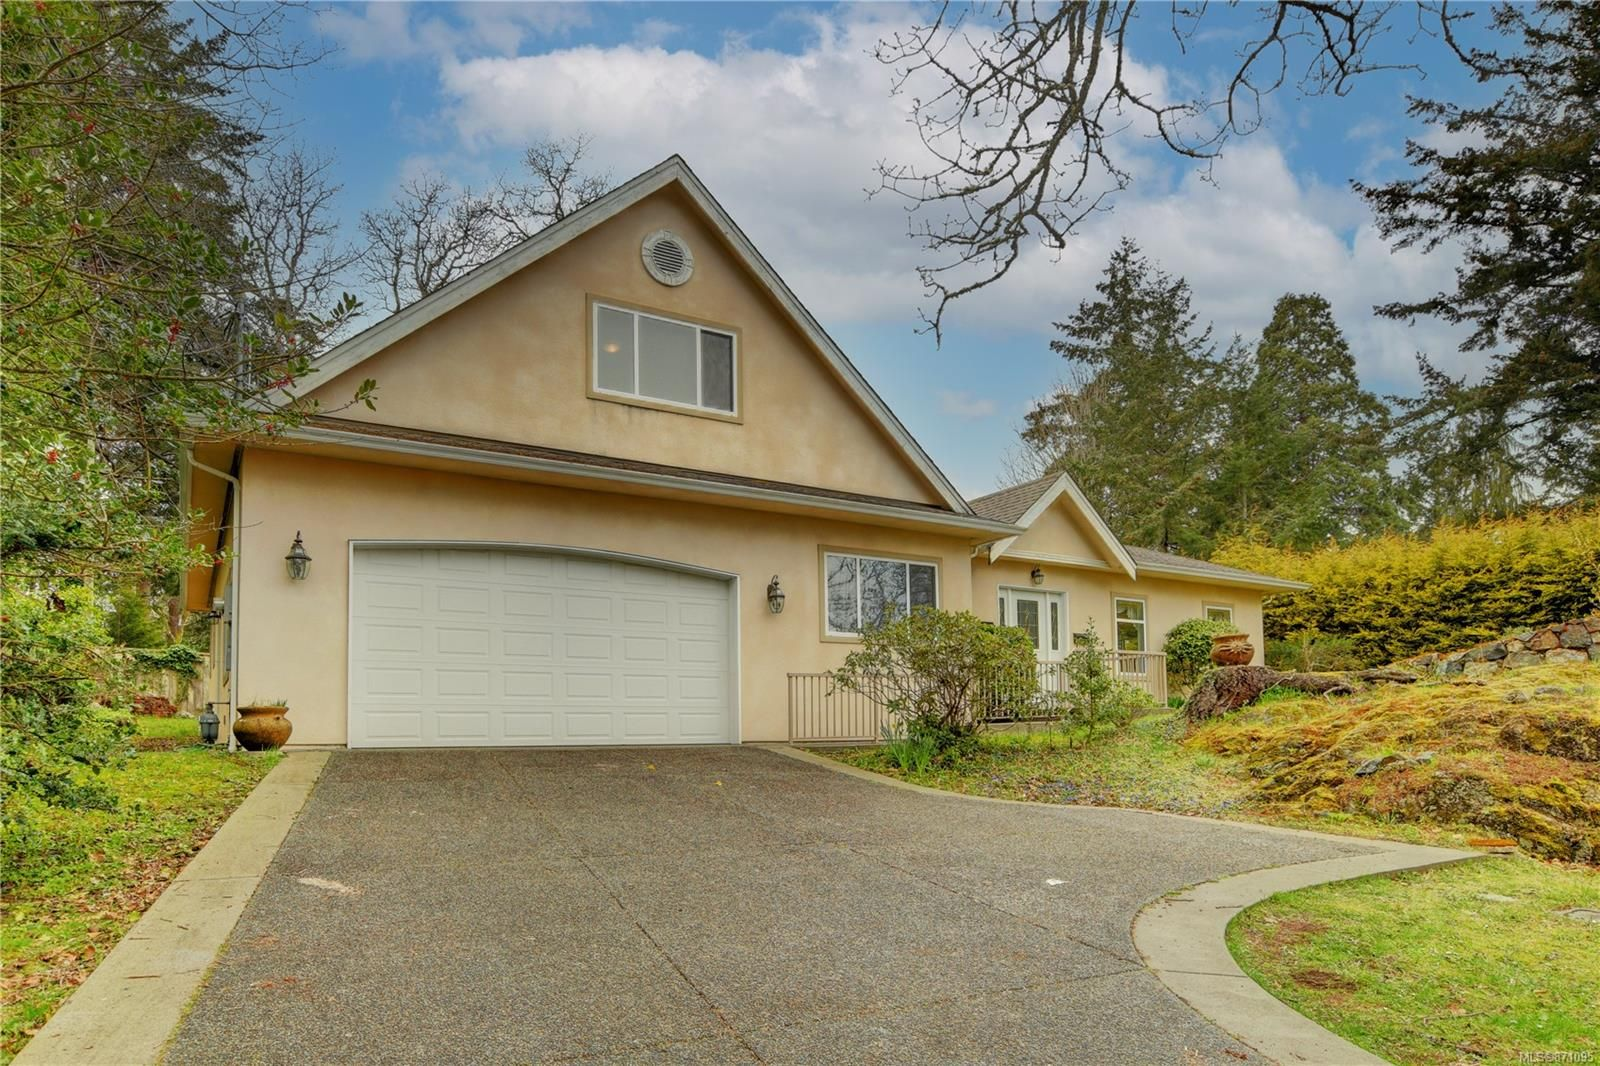 Main Photo: 4146 Cedar Hill Rd in : SE Mt Doug House for sale (Saanich East)  : MLS®# 871095